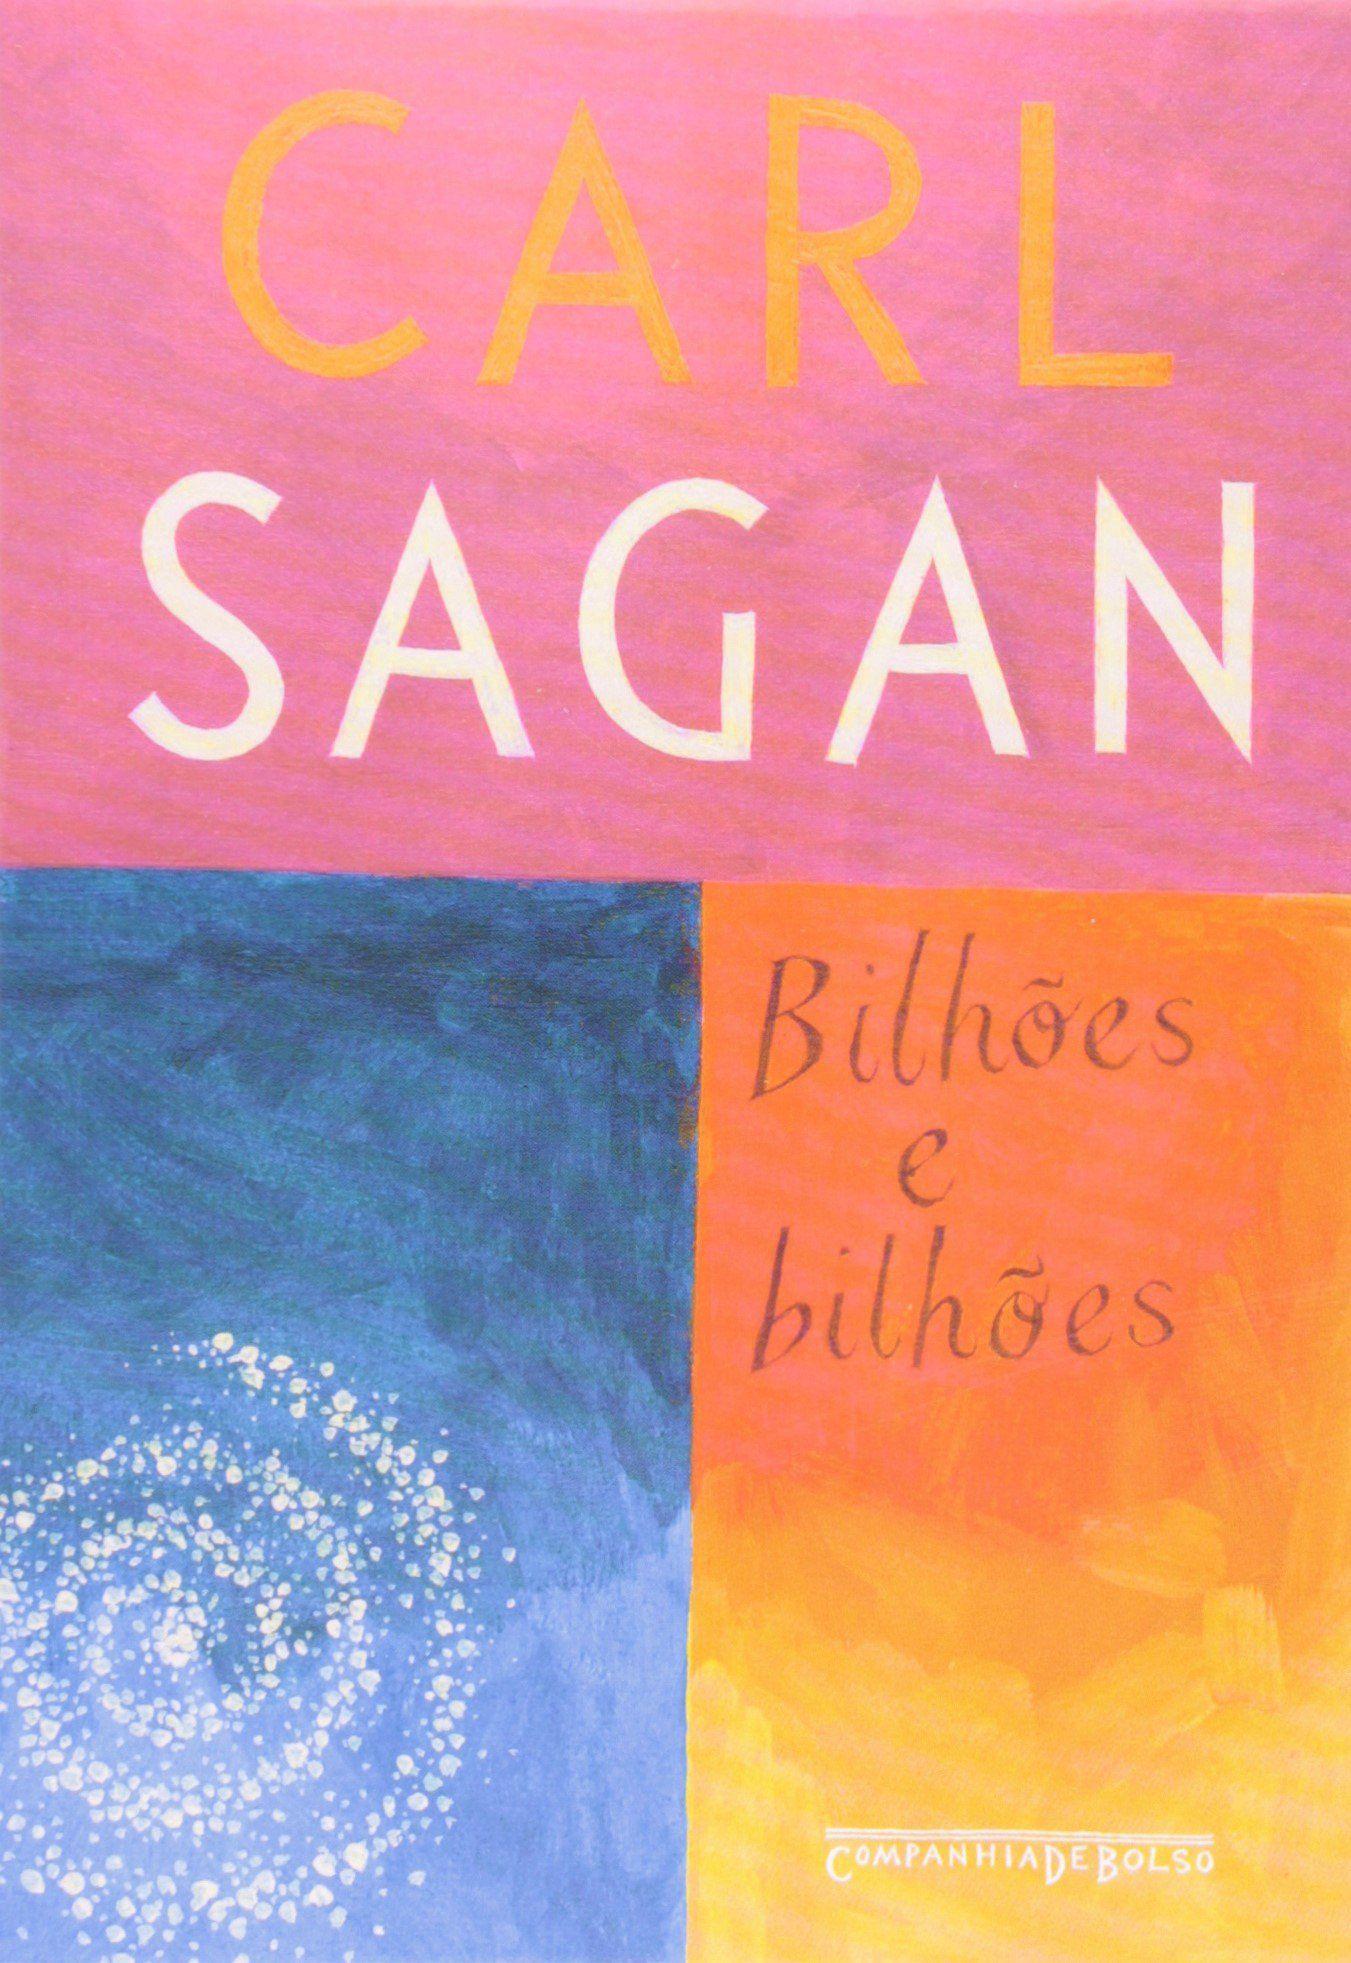 Bilhoes E Bilhoes Ultimo Livro Escrito Por Carl Sagan E